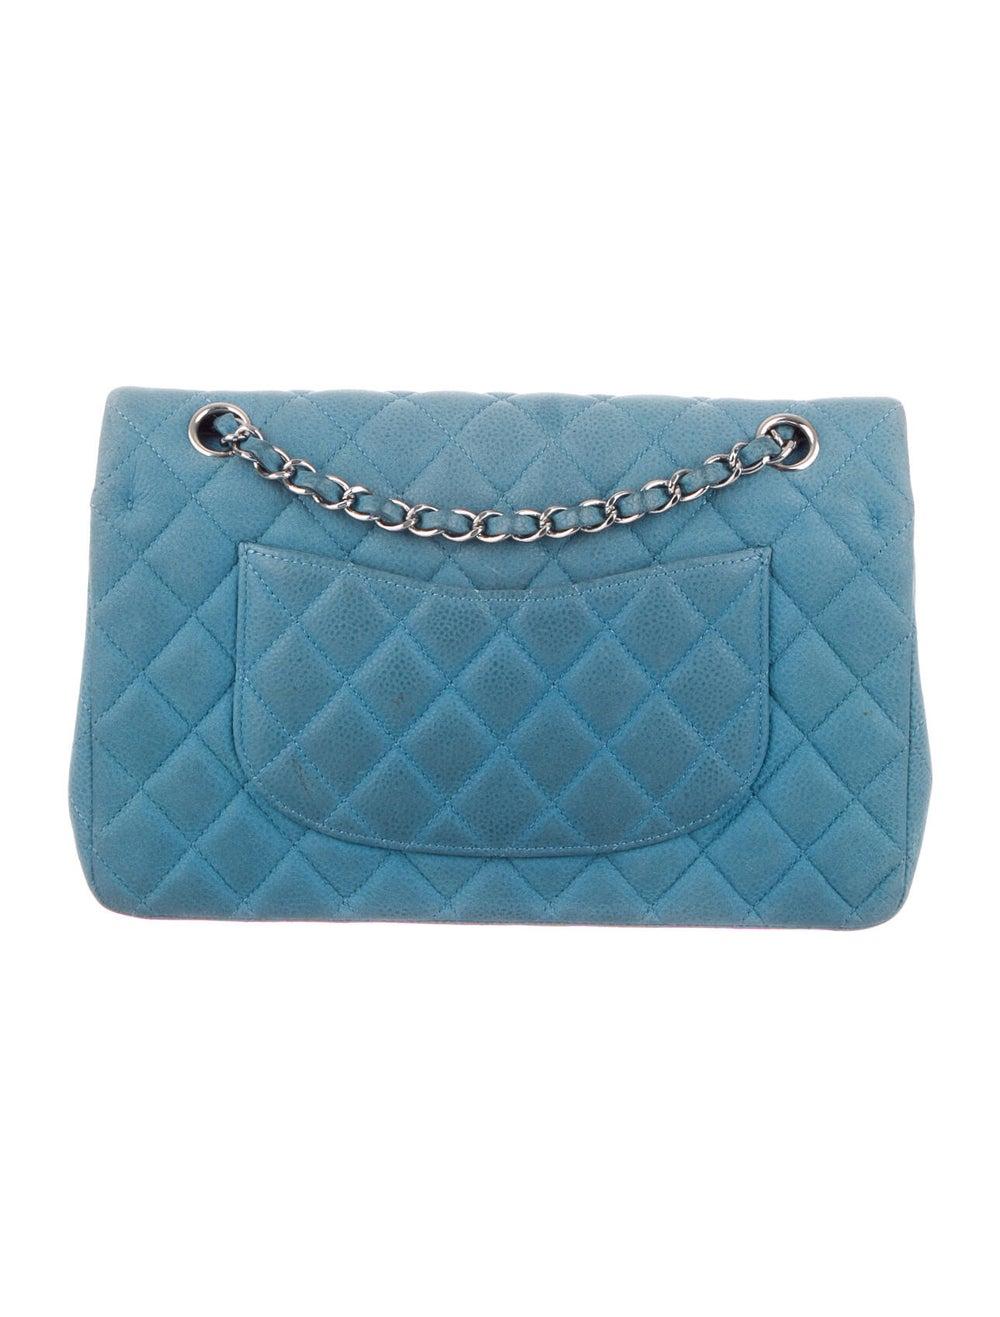 Chanel Nubuck Medium Classic Double Flap Bag Blue - image 4